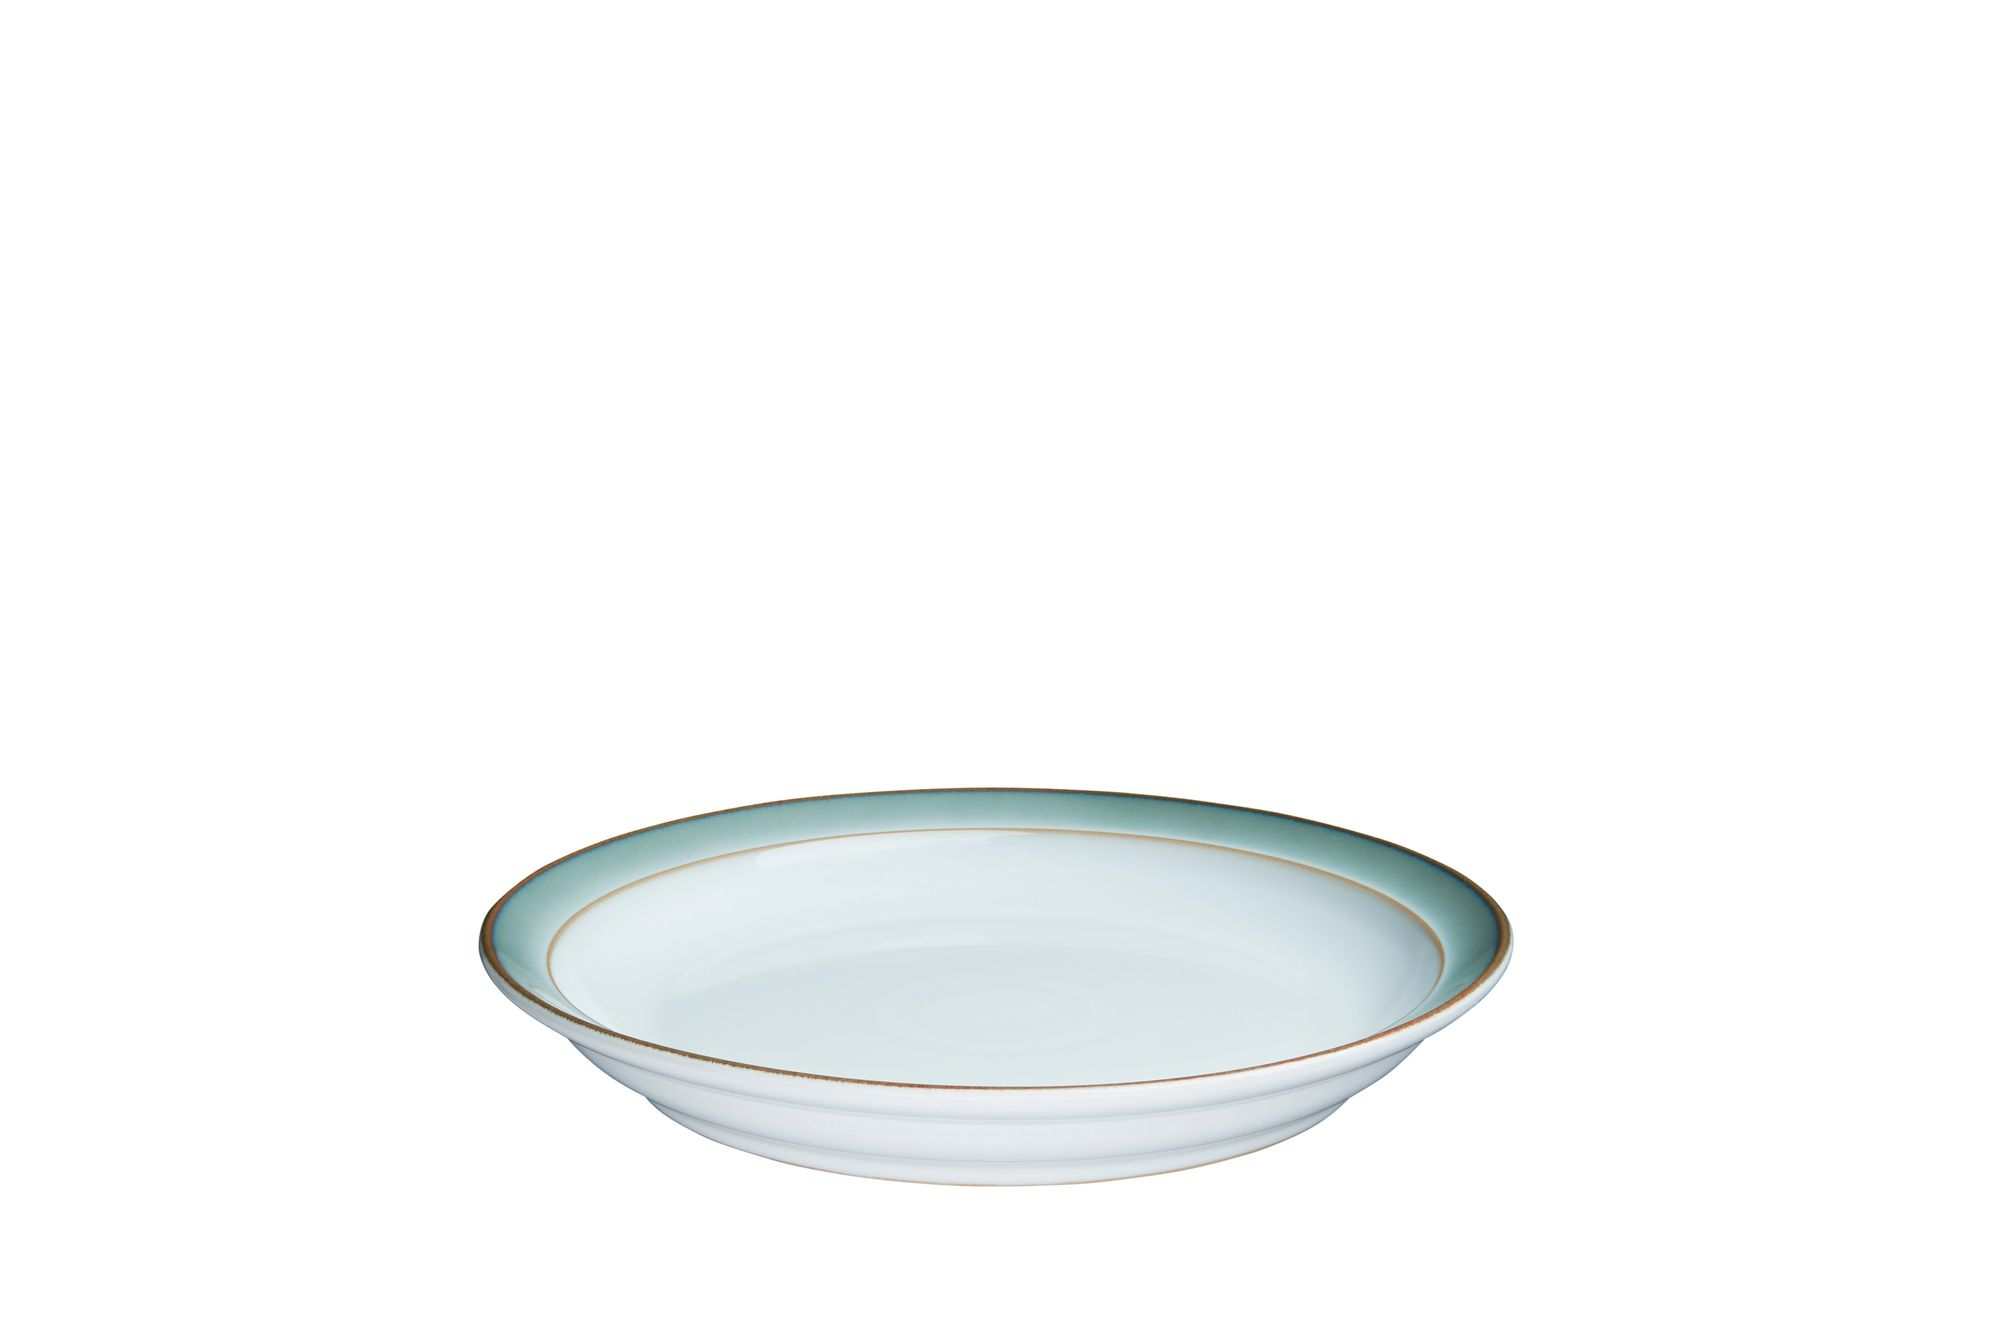 Denby Regency Green Side Plate Deep Plate 21.5 x 3cm thumb 1